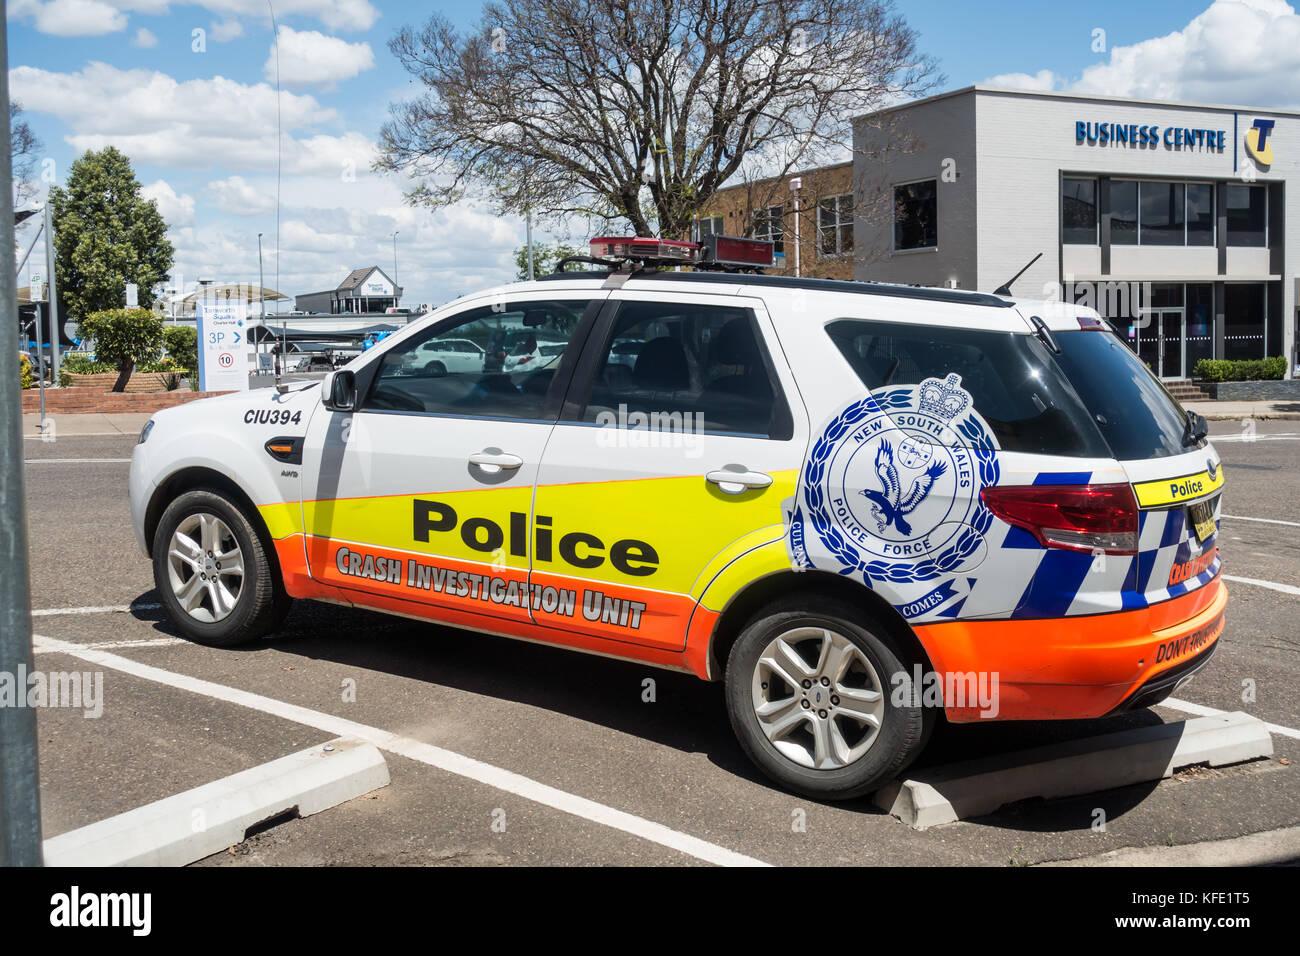 Australian Police Car Stock Photos & Australian Police Car Stock